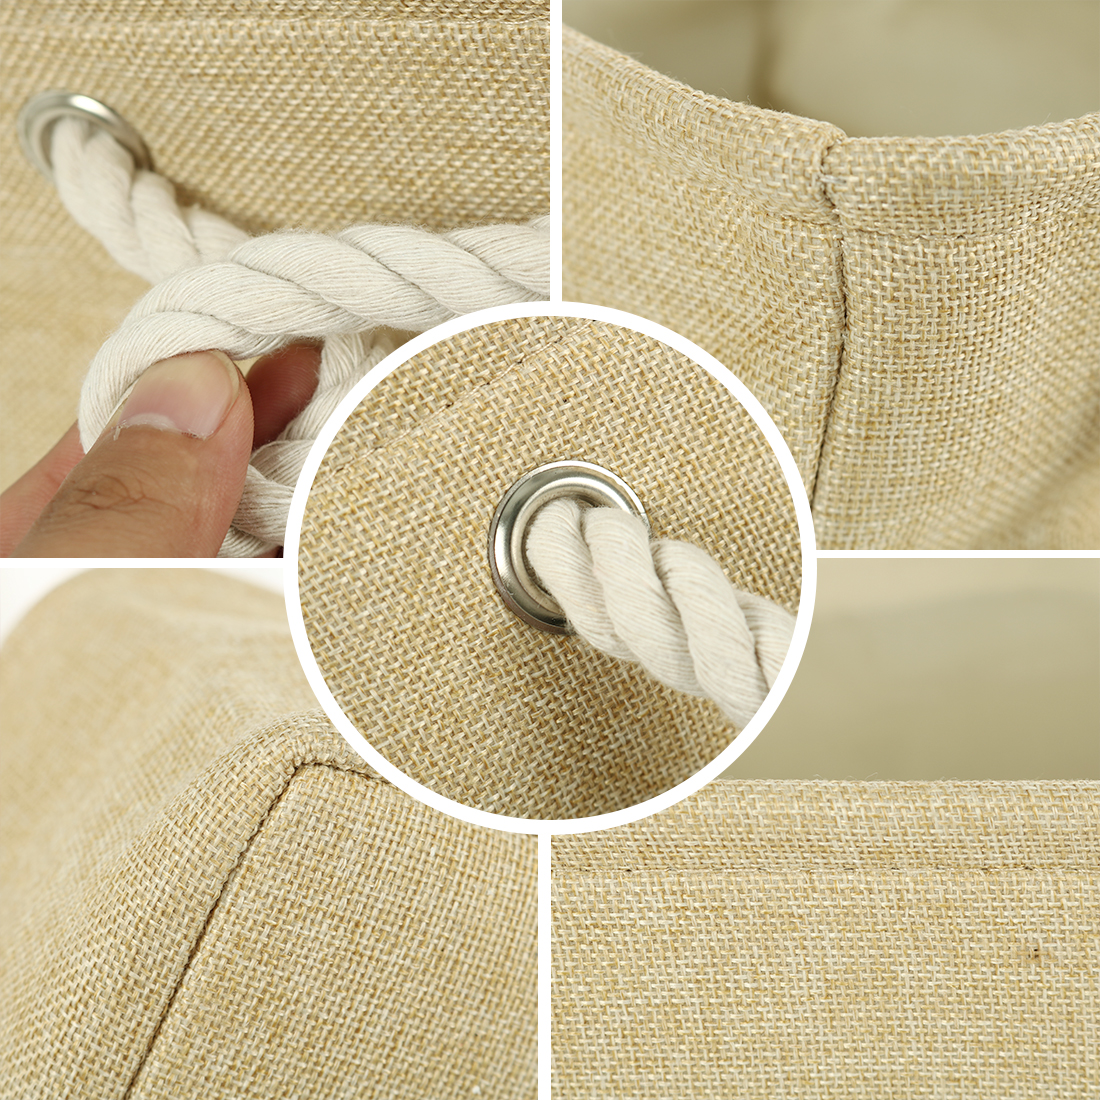 Home Fabric Storage Basket Bin w Dual Rope Handles for Laundry Khaki, Small - image 1 de 8